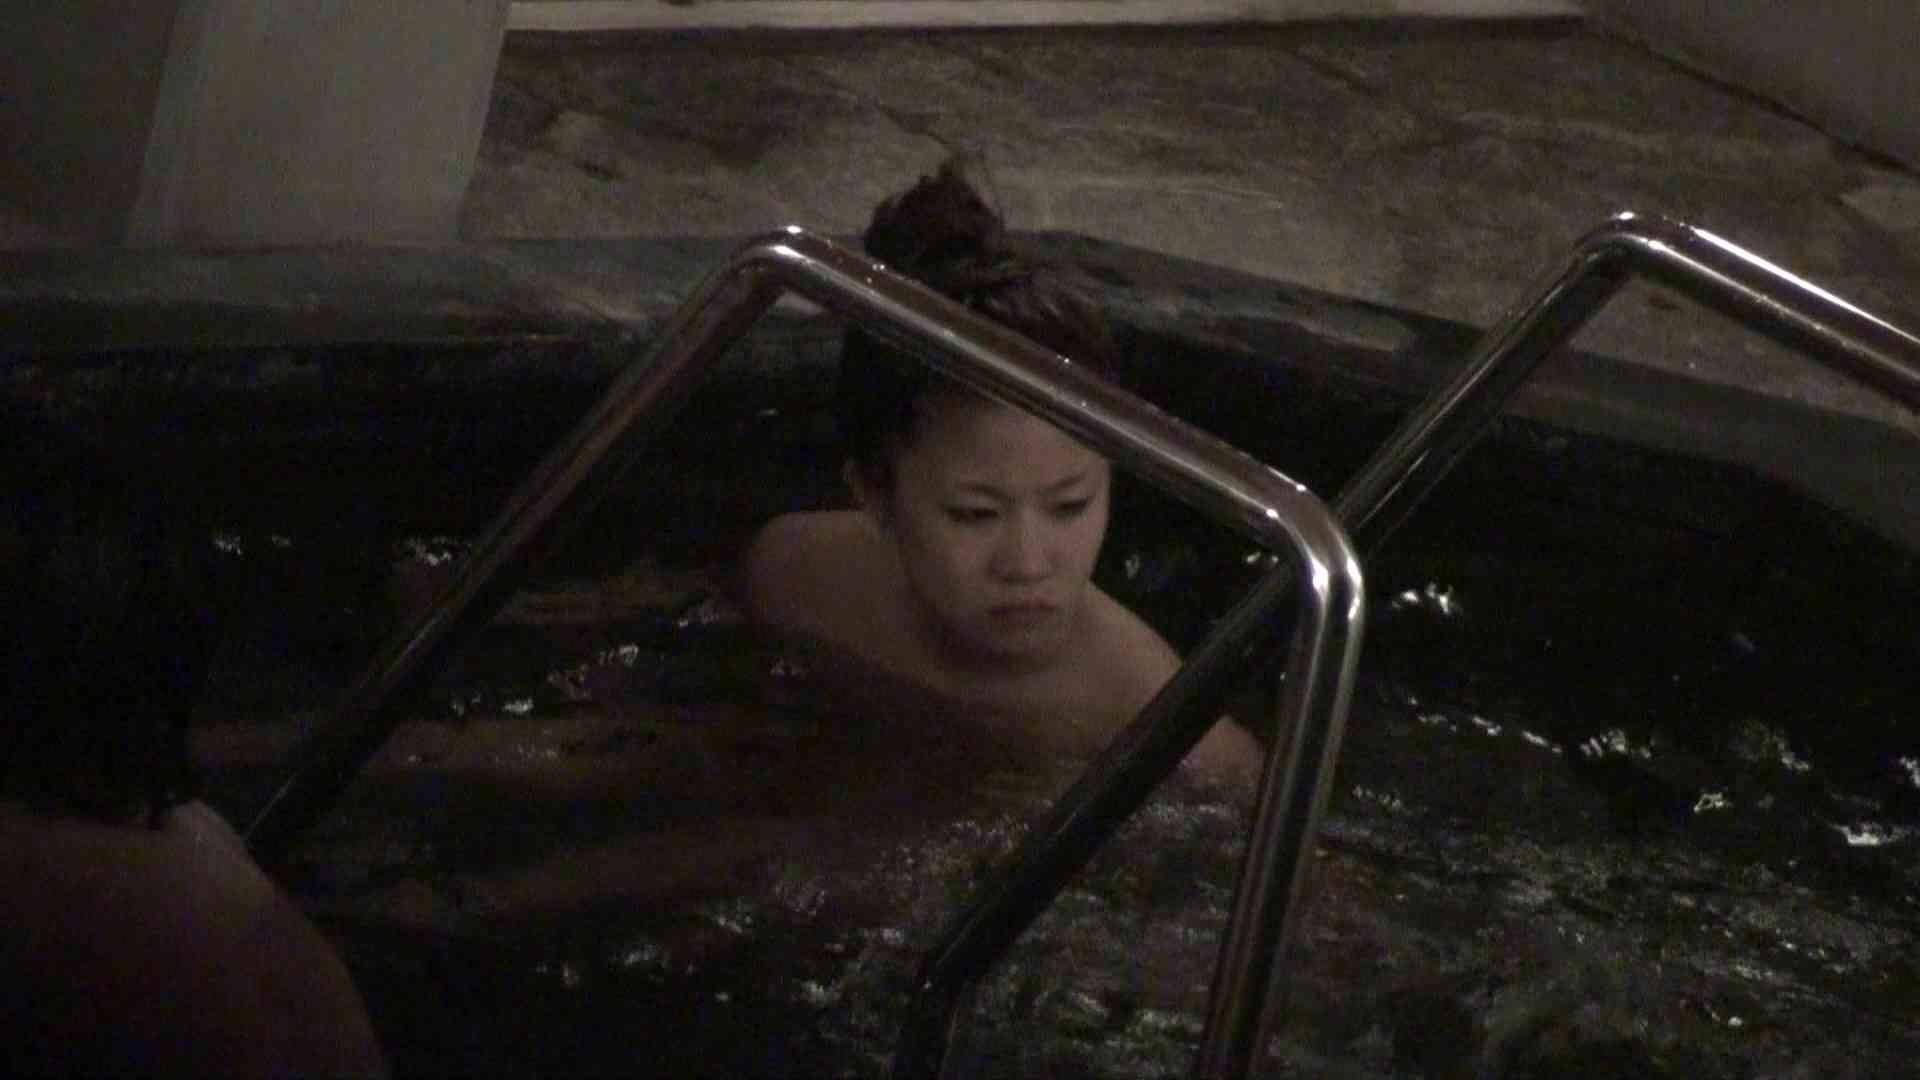 Aquaな露天風呂Vol.378 0   0  88連発 35